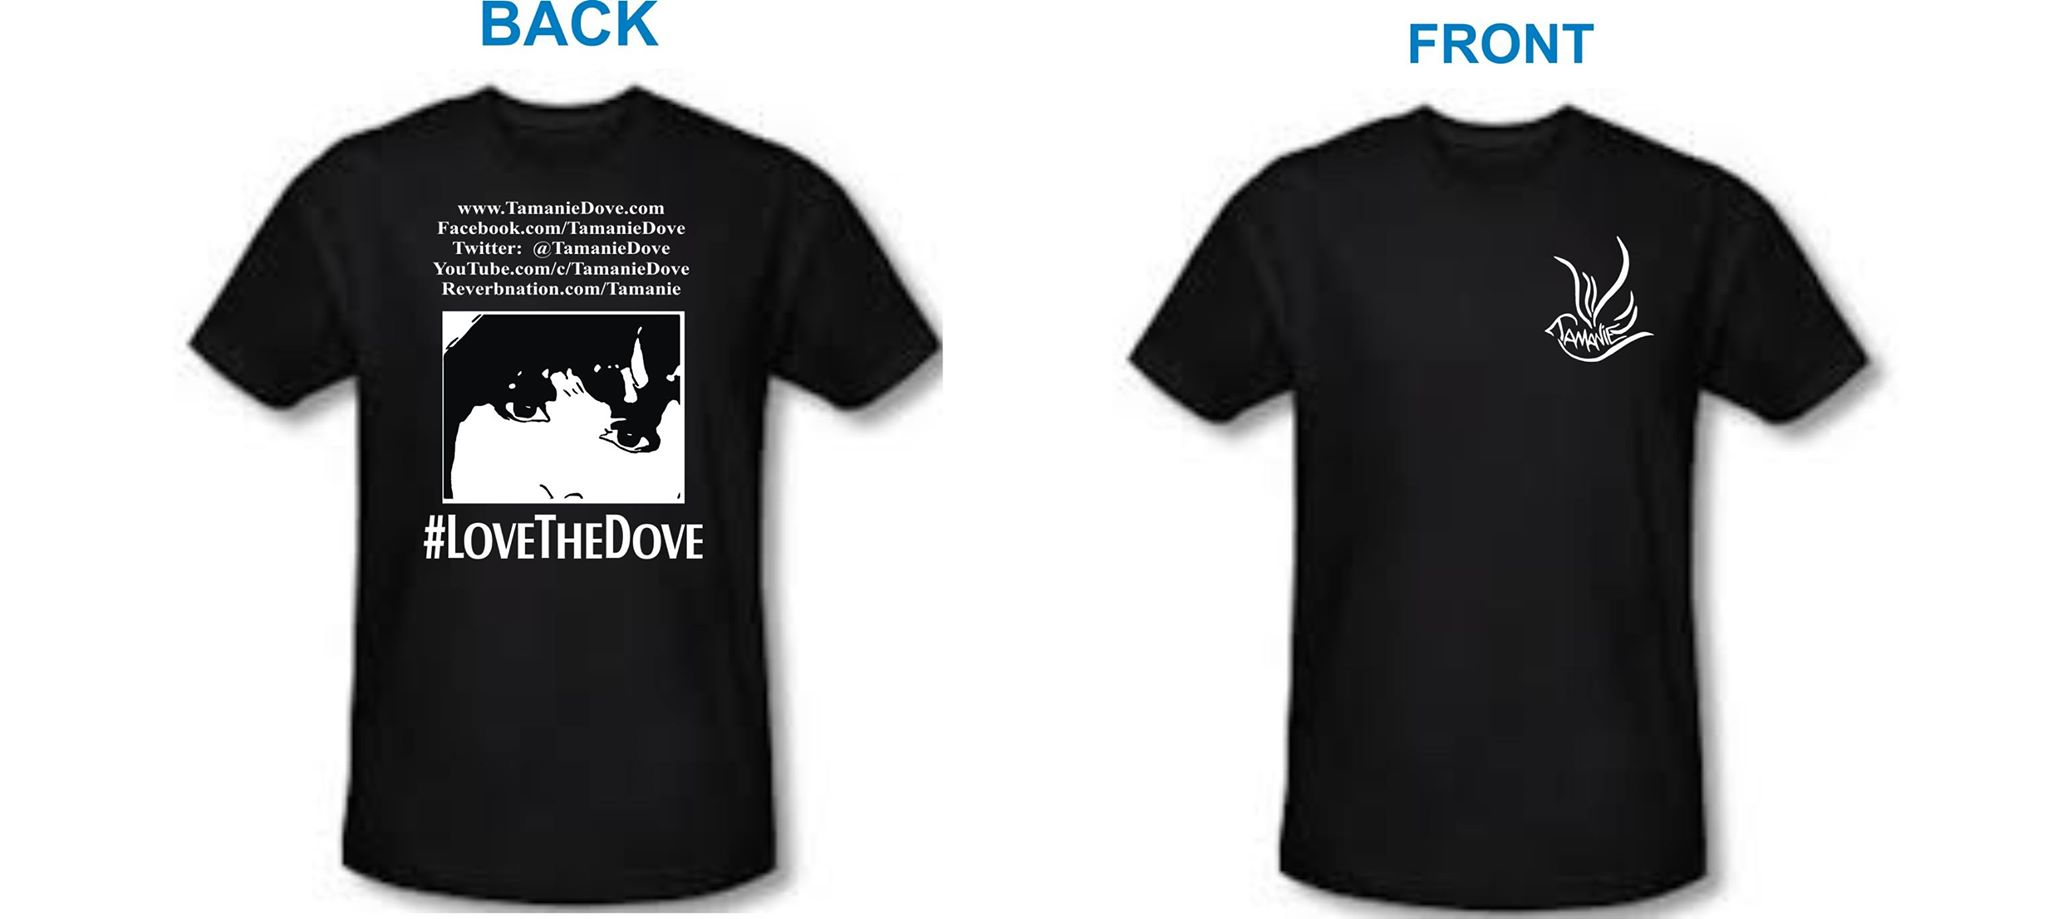 Black t shirt reverbnation - Black T Shirt Reverbnation 37